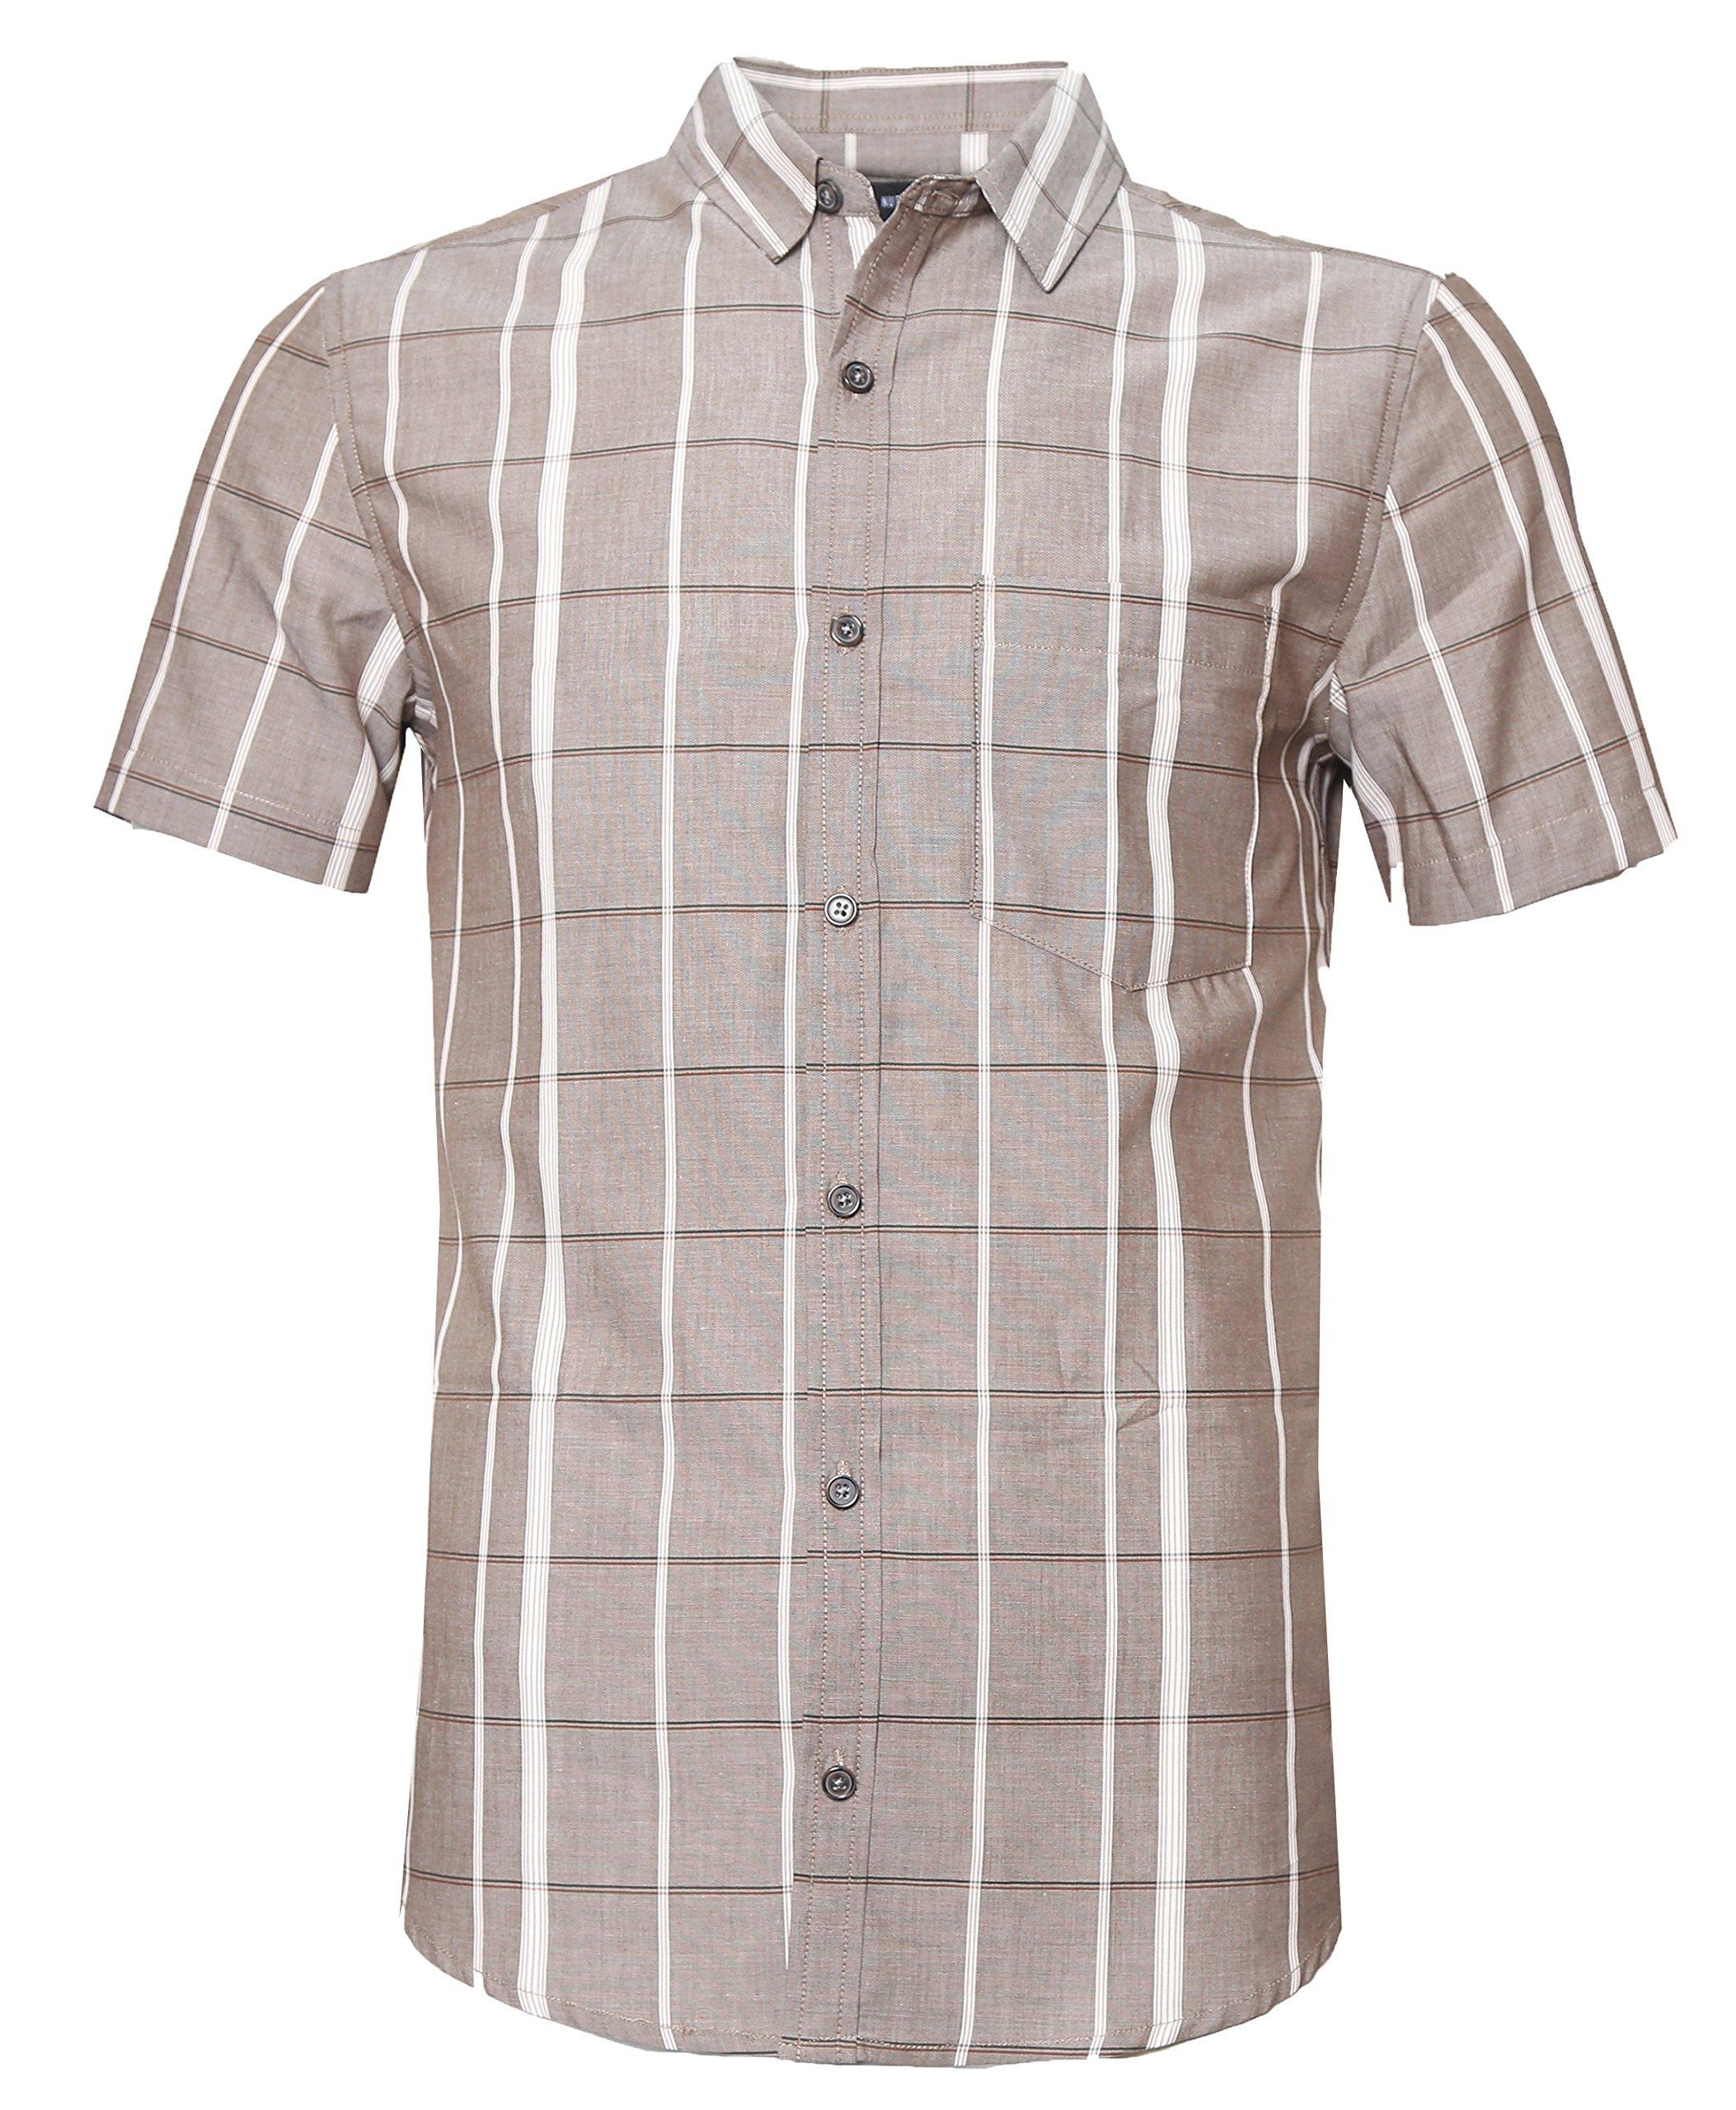 SOOPO Mens Casual Regular Fit Short Sleeve Button Down Plaid Checked Shirts Brown 3XL